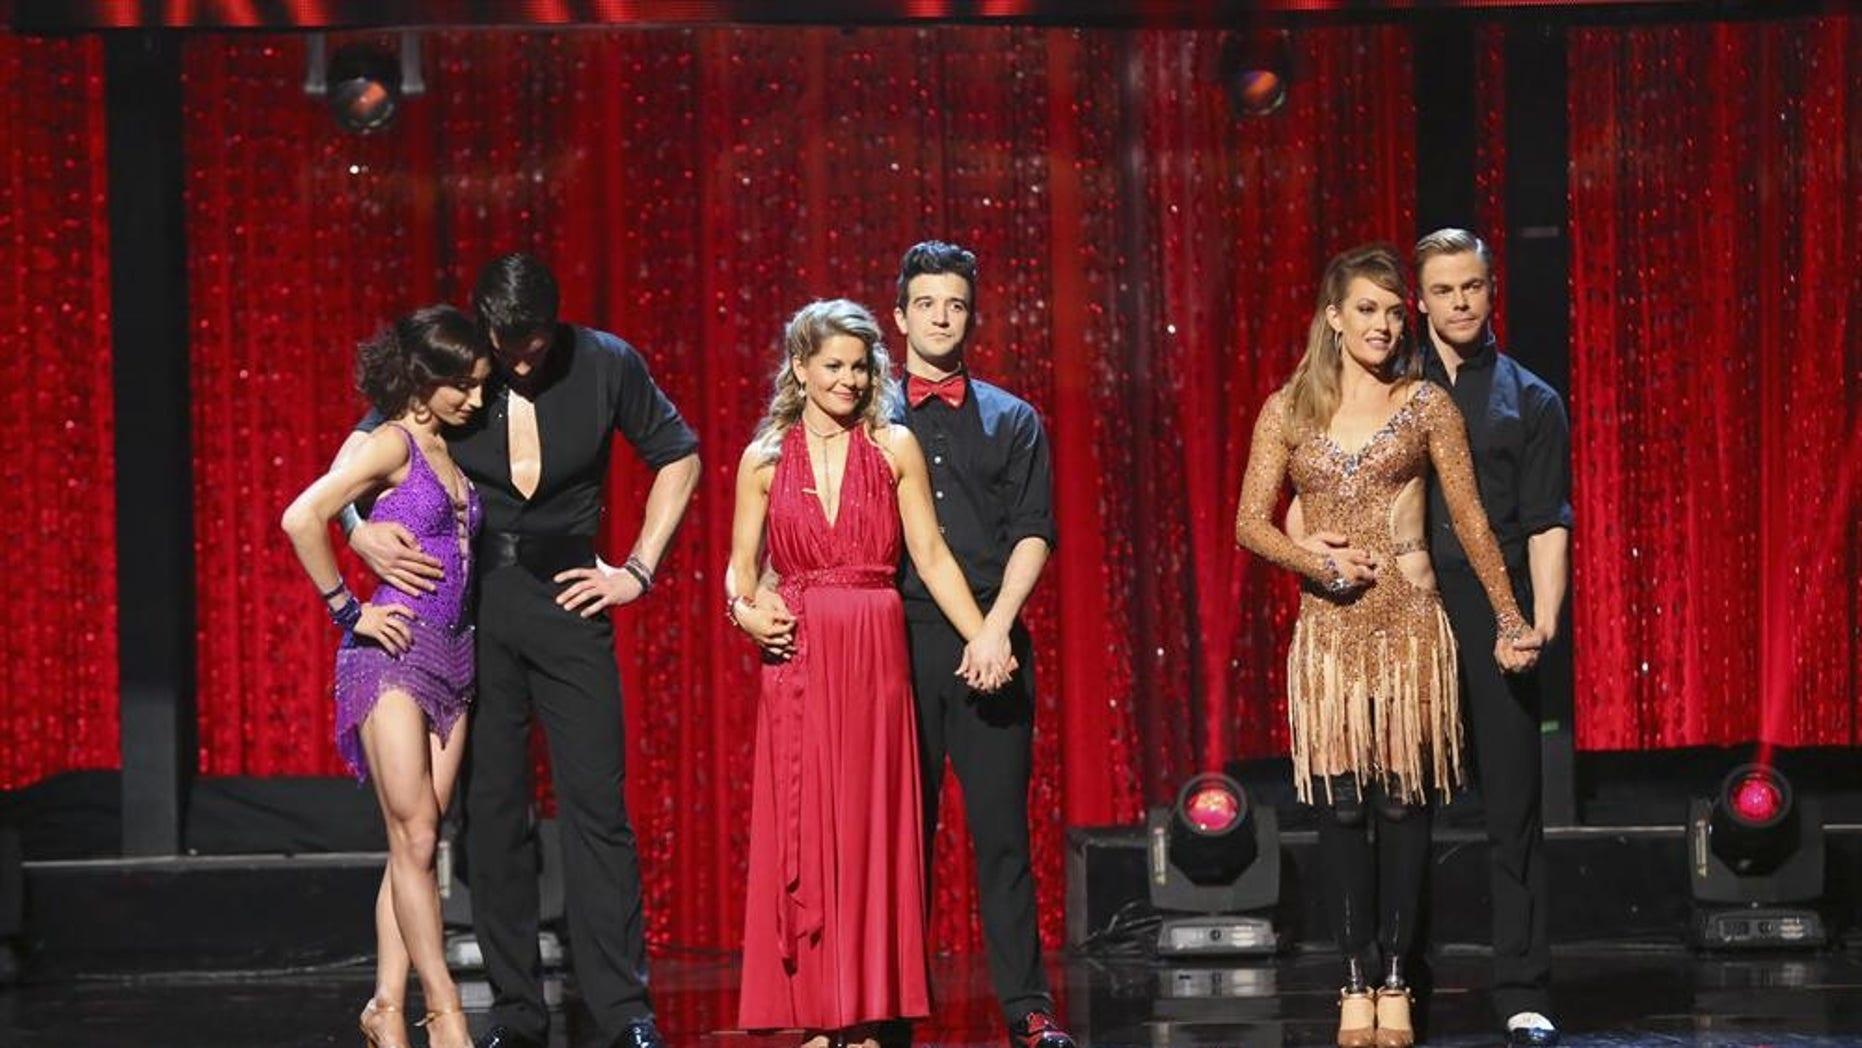 "Meryl Davis, Maksim Chmerkovskiy, Cancace Cameron Bure, Mark Ballas, Am Purdy and Derek Hough in the finals of ""Dancing with the Stars."""